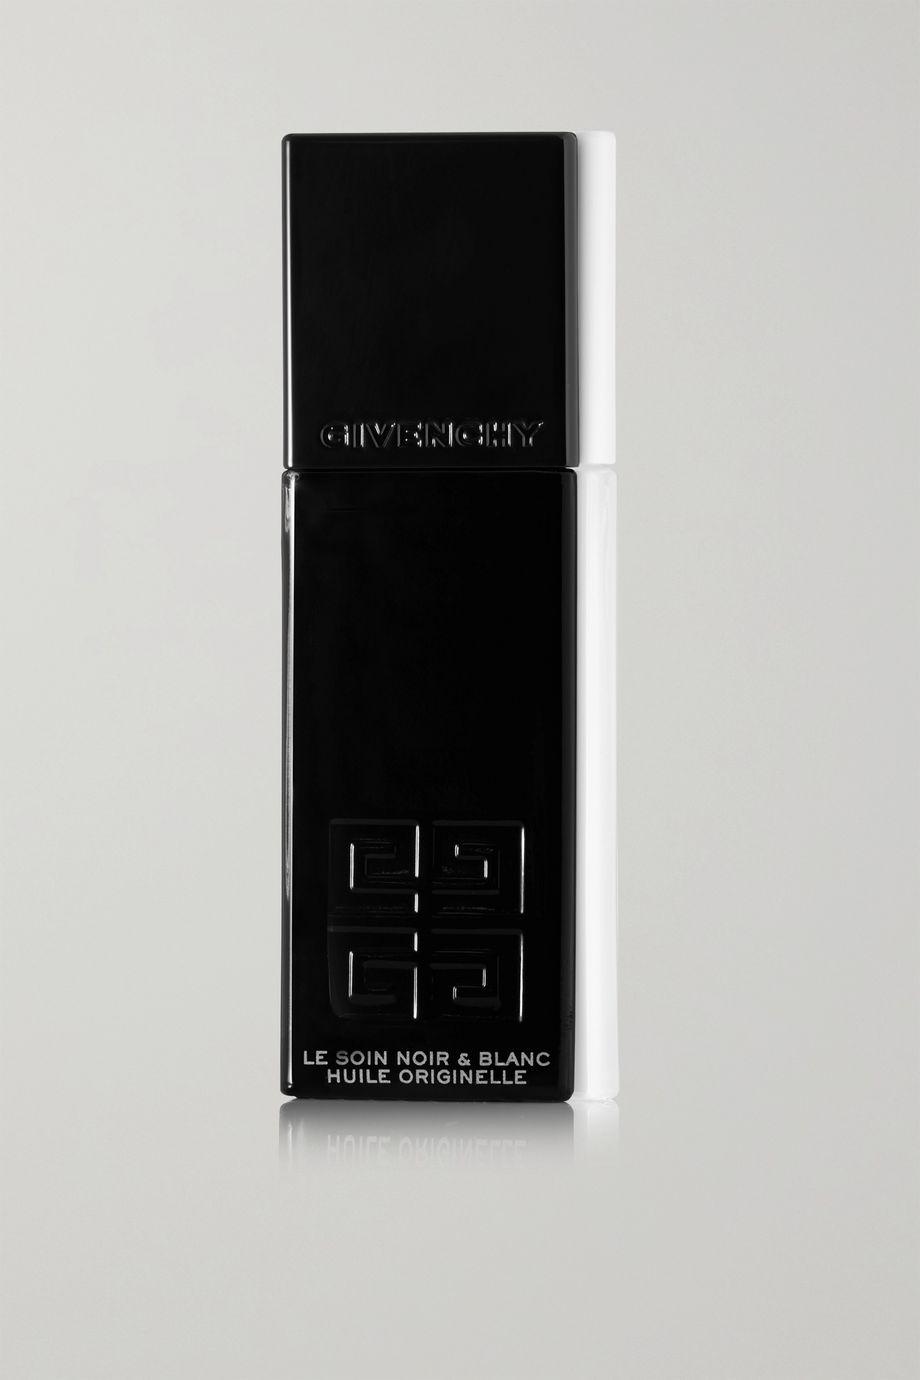 Givenchy Beauty Le Soin Noir & Blanc Huiles Originelles, 2 x 15ml